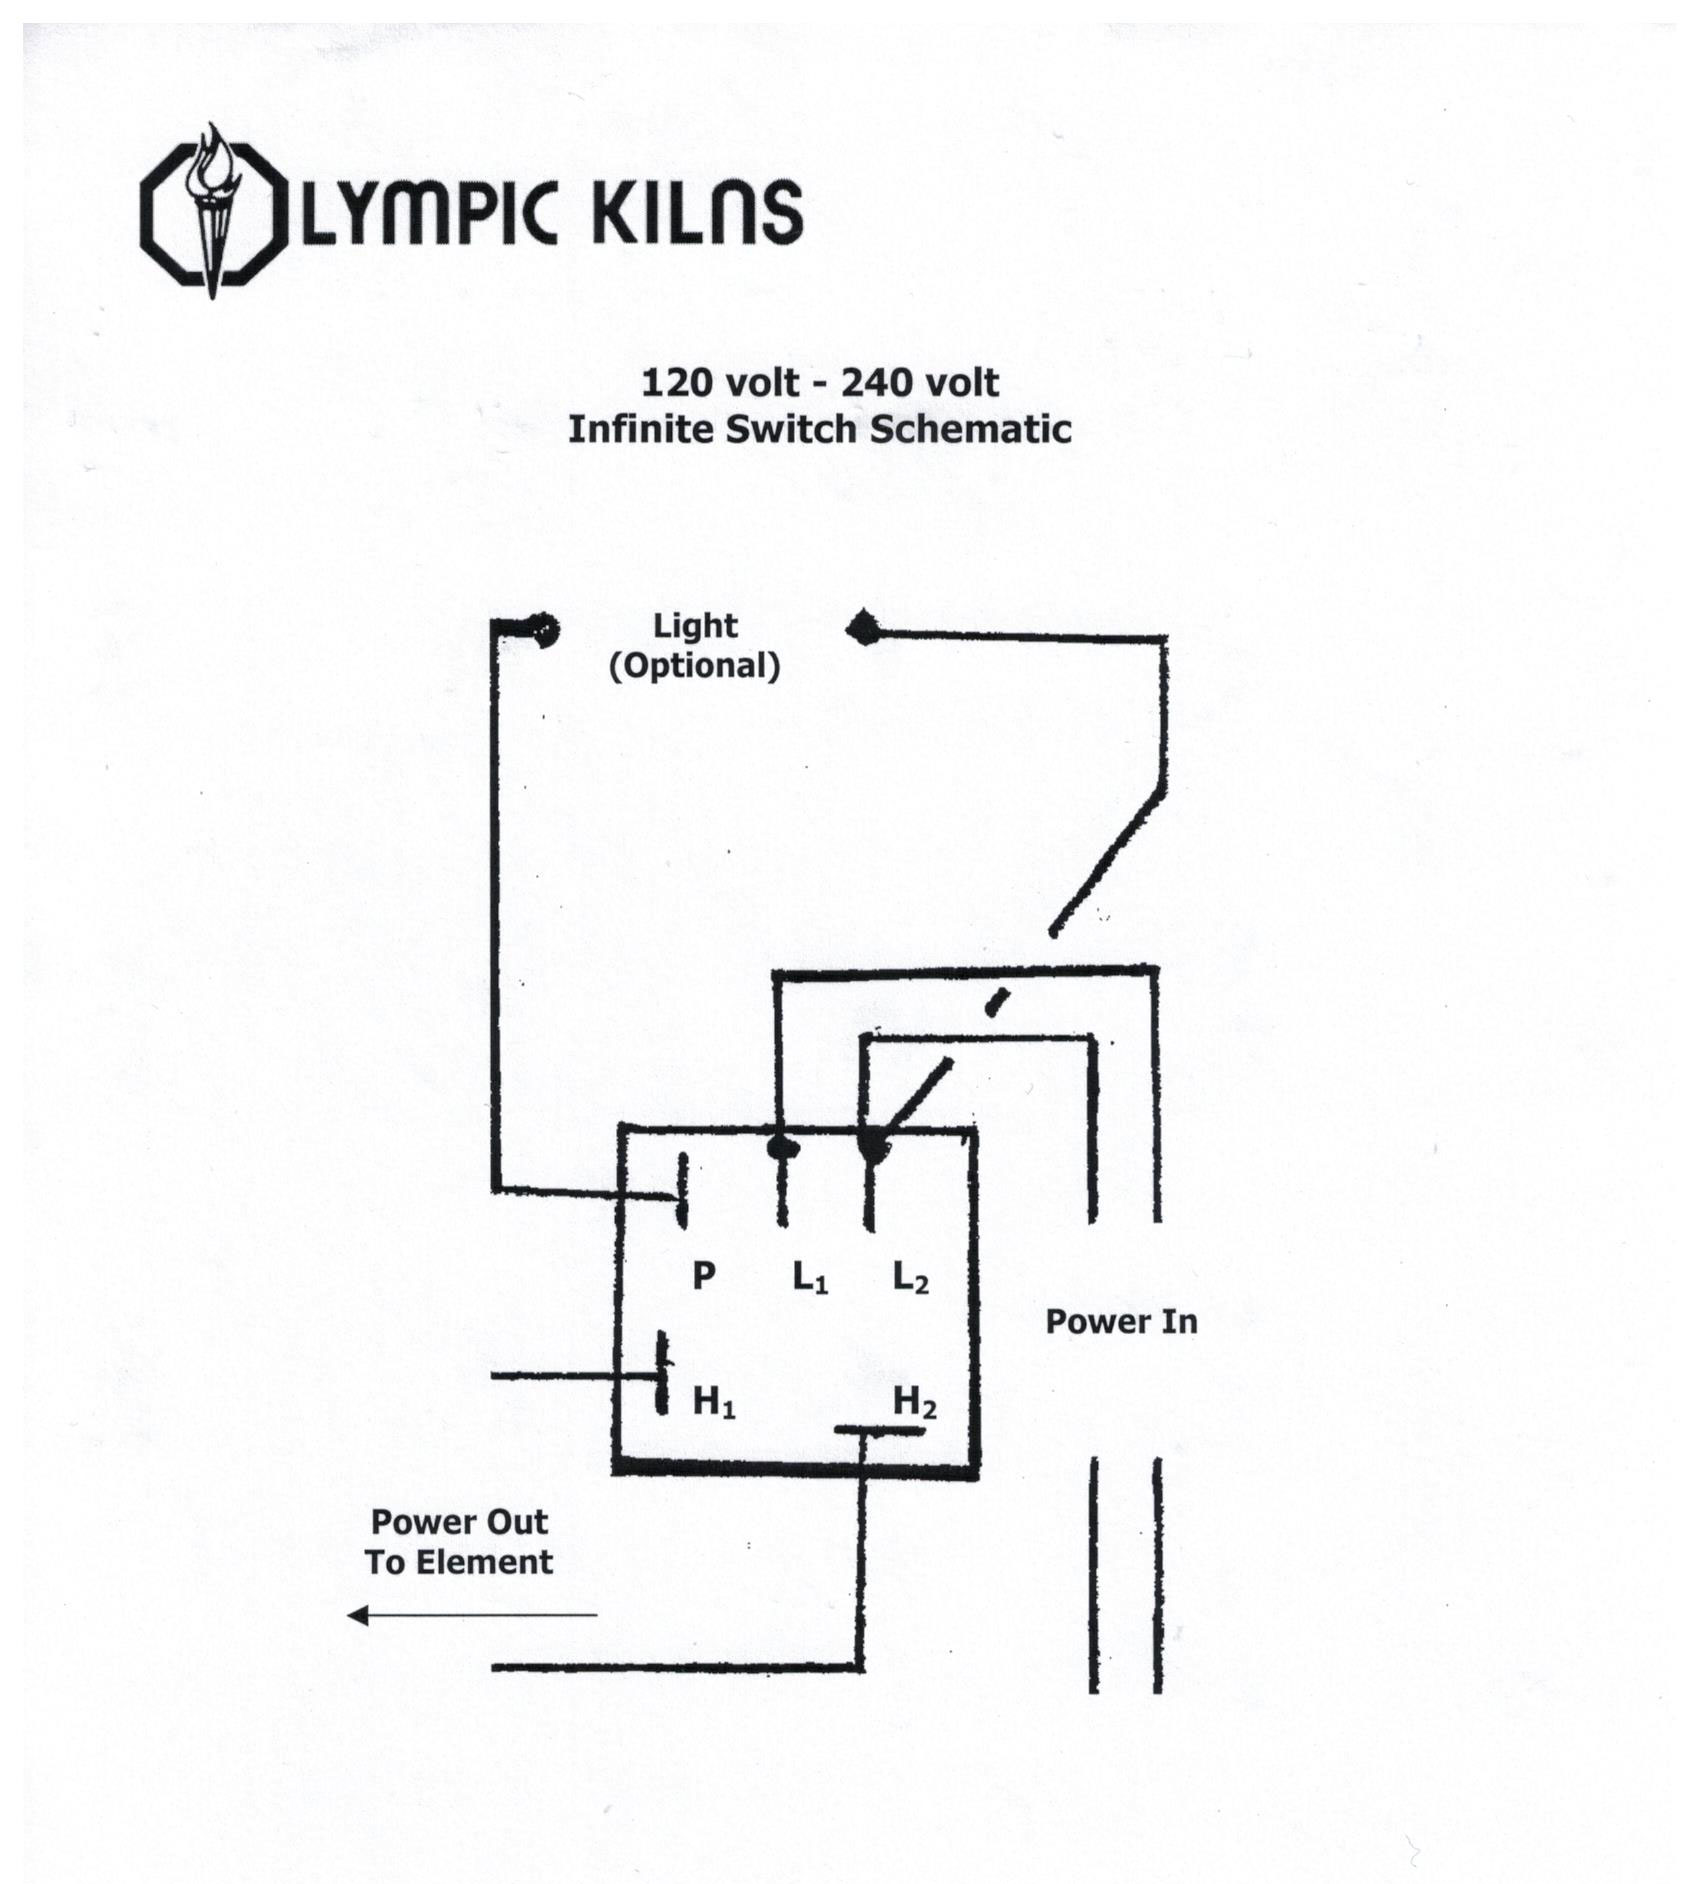 Element Electric Furnace Wiring Diagram 2 King